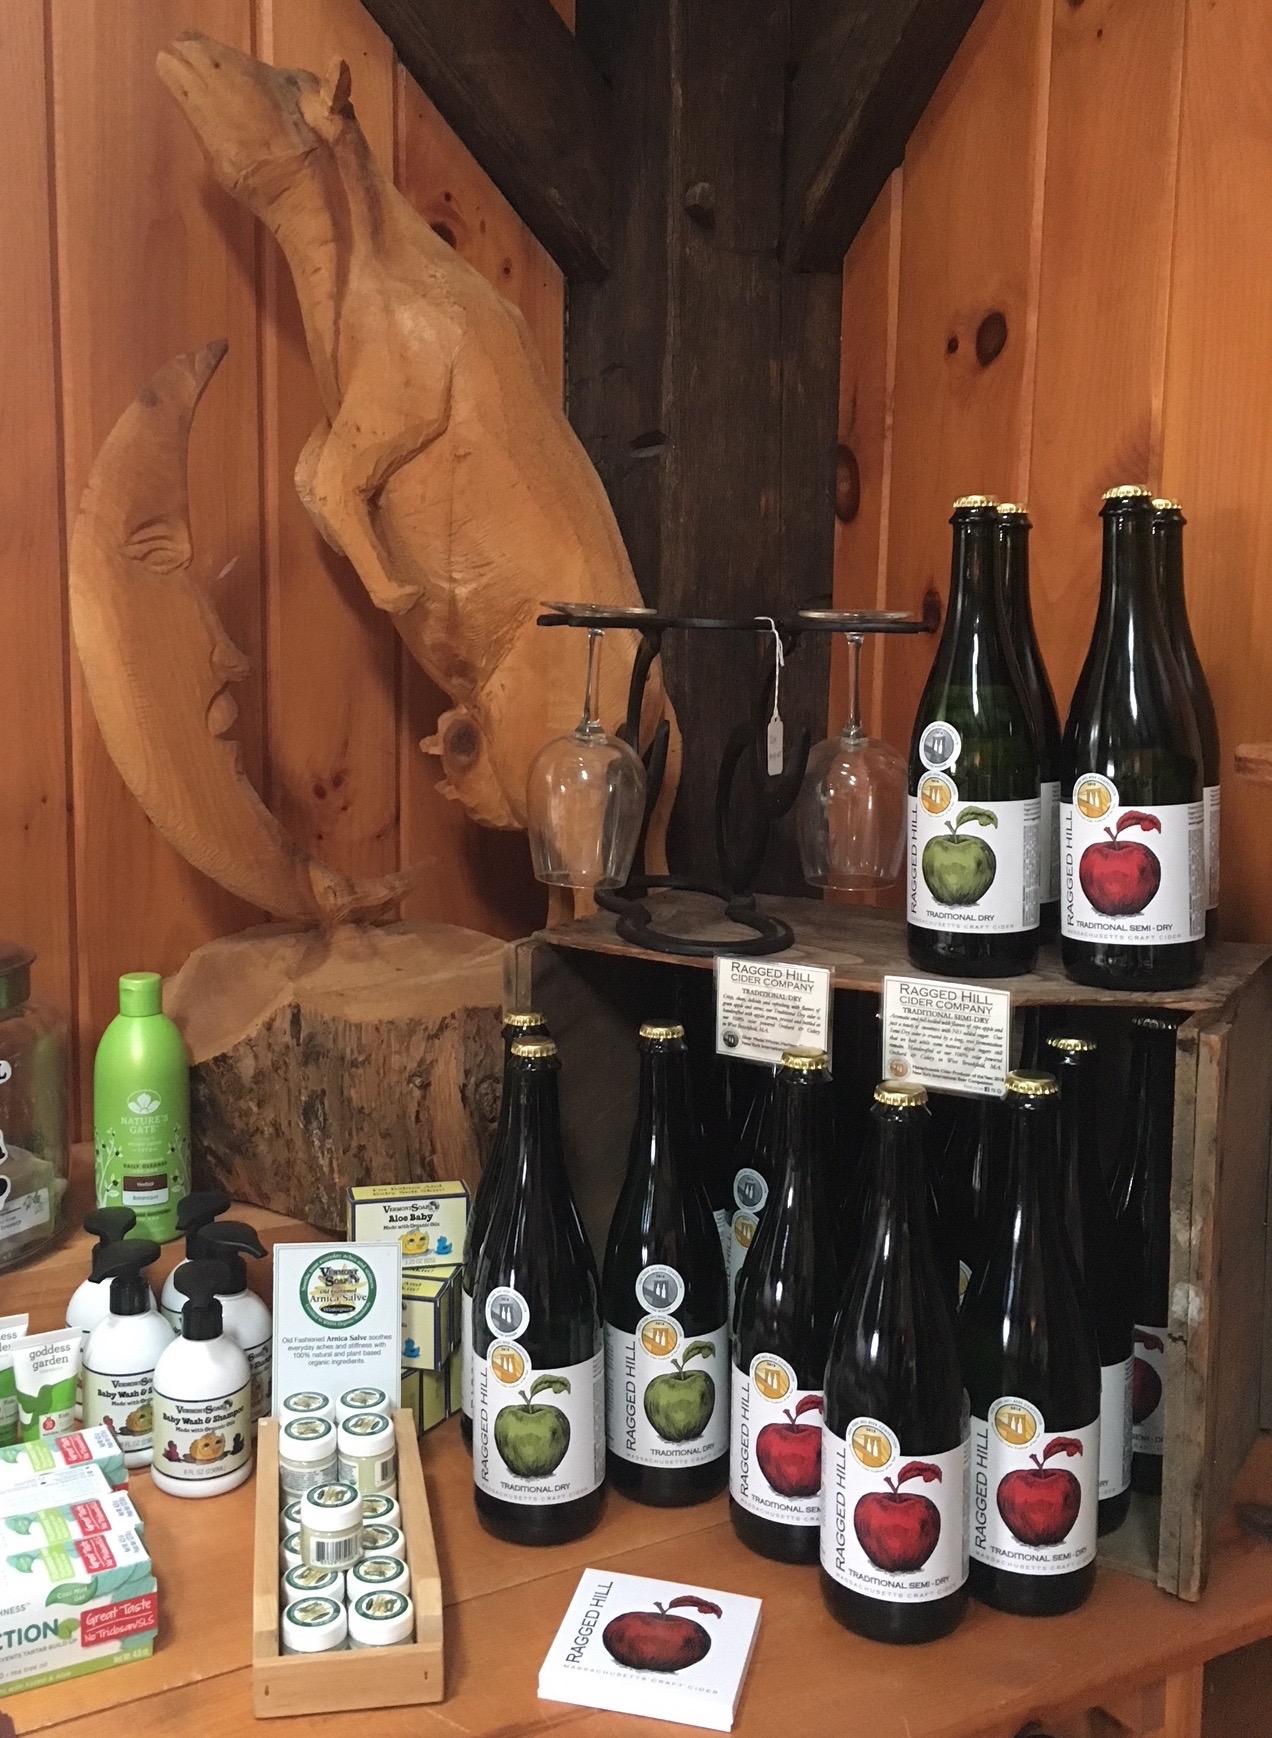 RETAILERS & RESTAURANTS - Carter and Stevens Farm Store - Barre, MAHomefield Kitchen & Brewery - Sturbridge, MACentral Package Store - Brookfield, MARapscallion Brewery & Tap Room - Sturbridge, MAQuail Hollow Country Club - Oakham, MAYankee Spirits - Attleboro, Sturbridge & Swansea, MACraft Beer Cellar - Braintree, MANorth Main Provisions - Worcester, MAVolante Farms - Needham, MAPaired, Poured & Plated - Northborough, MASperry's Liquors - Hudson, MAThe Vin Bin - Hopkinton, MARiver Valley Co-op - Northampton, MAAtkins Farms Country Market - Amherst, MA